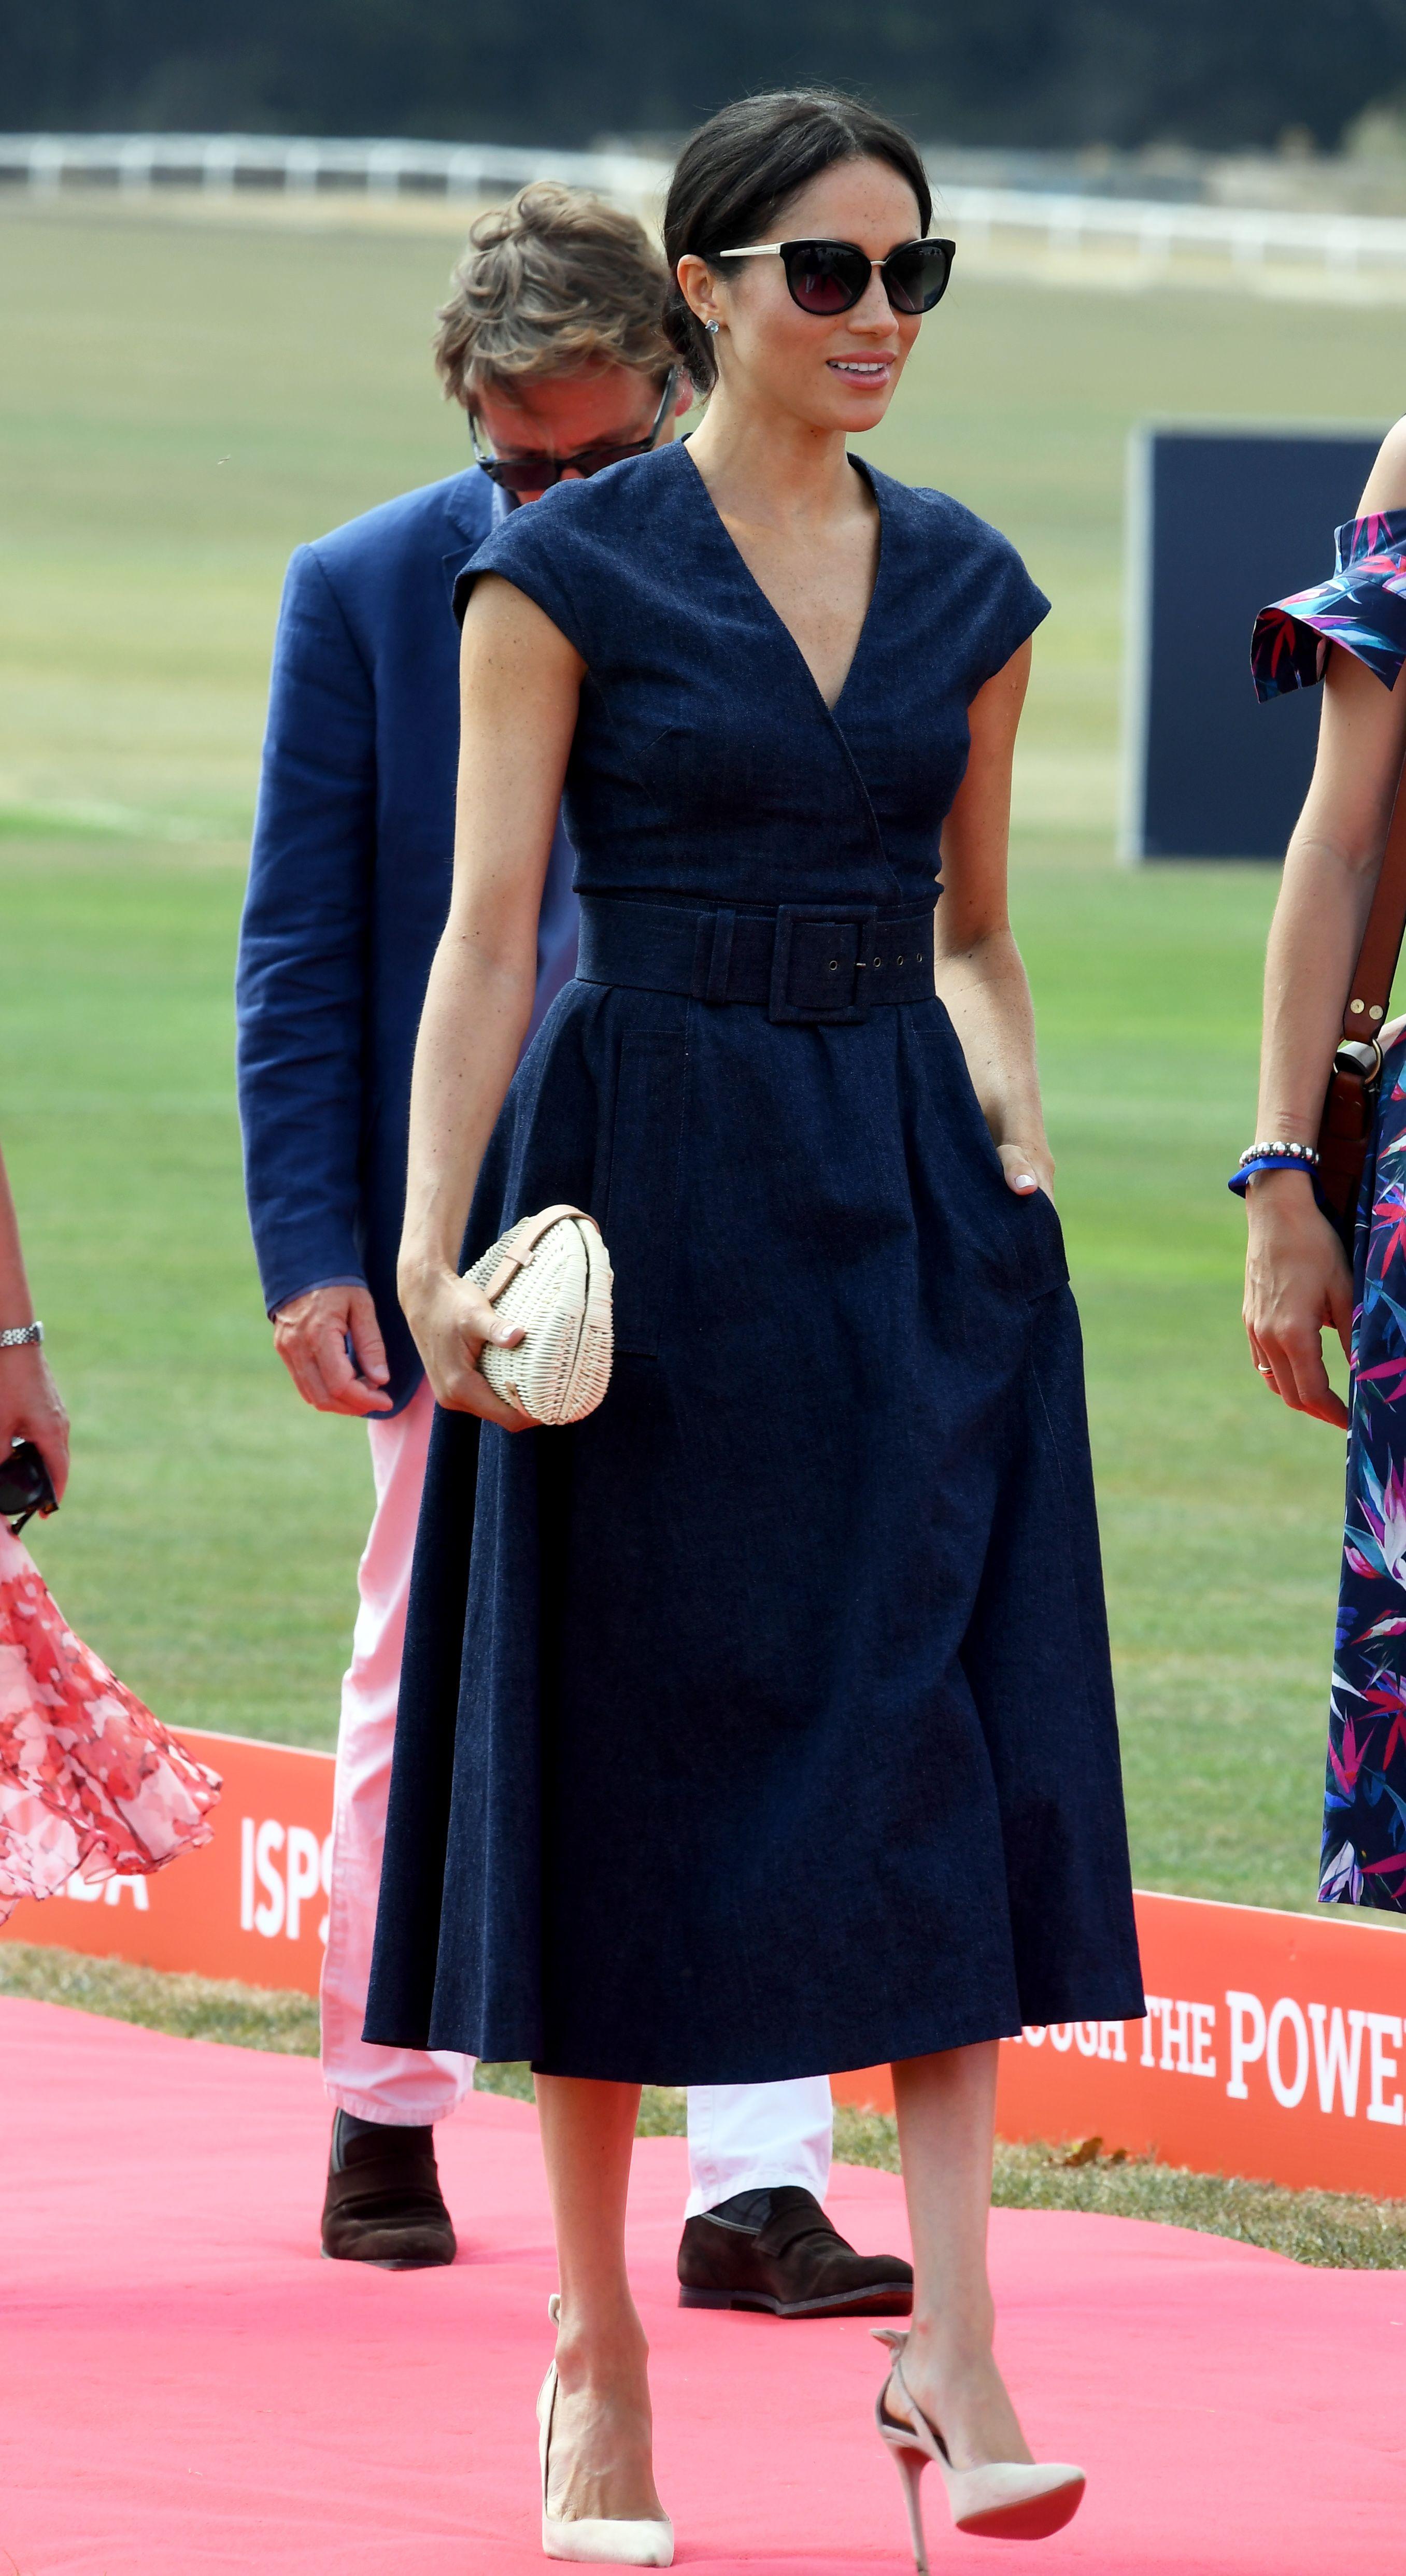 gettyimages 1008105102 - The Best Ten Looks of 'Meghan Markle'